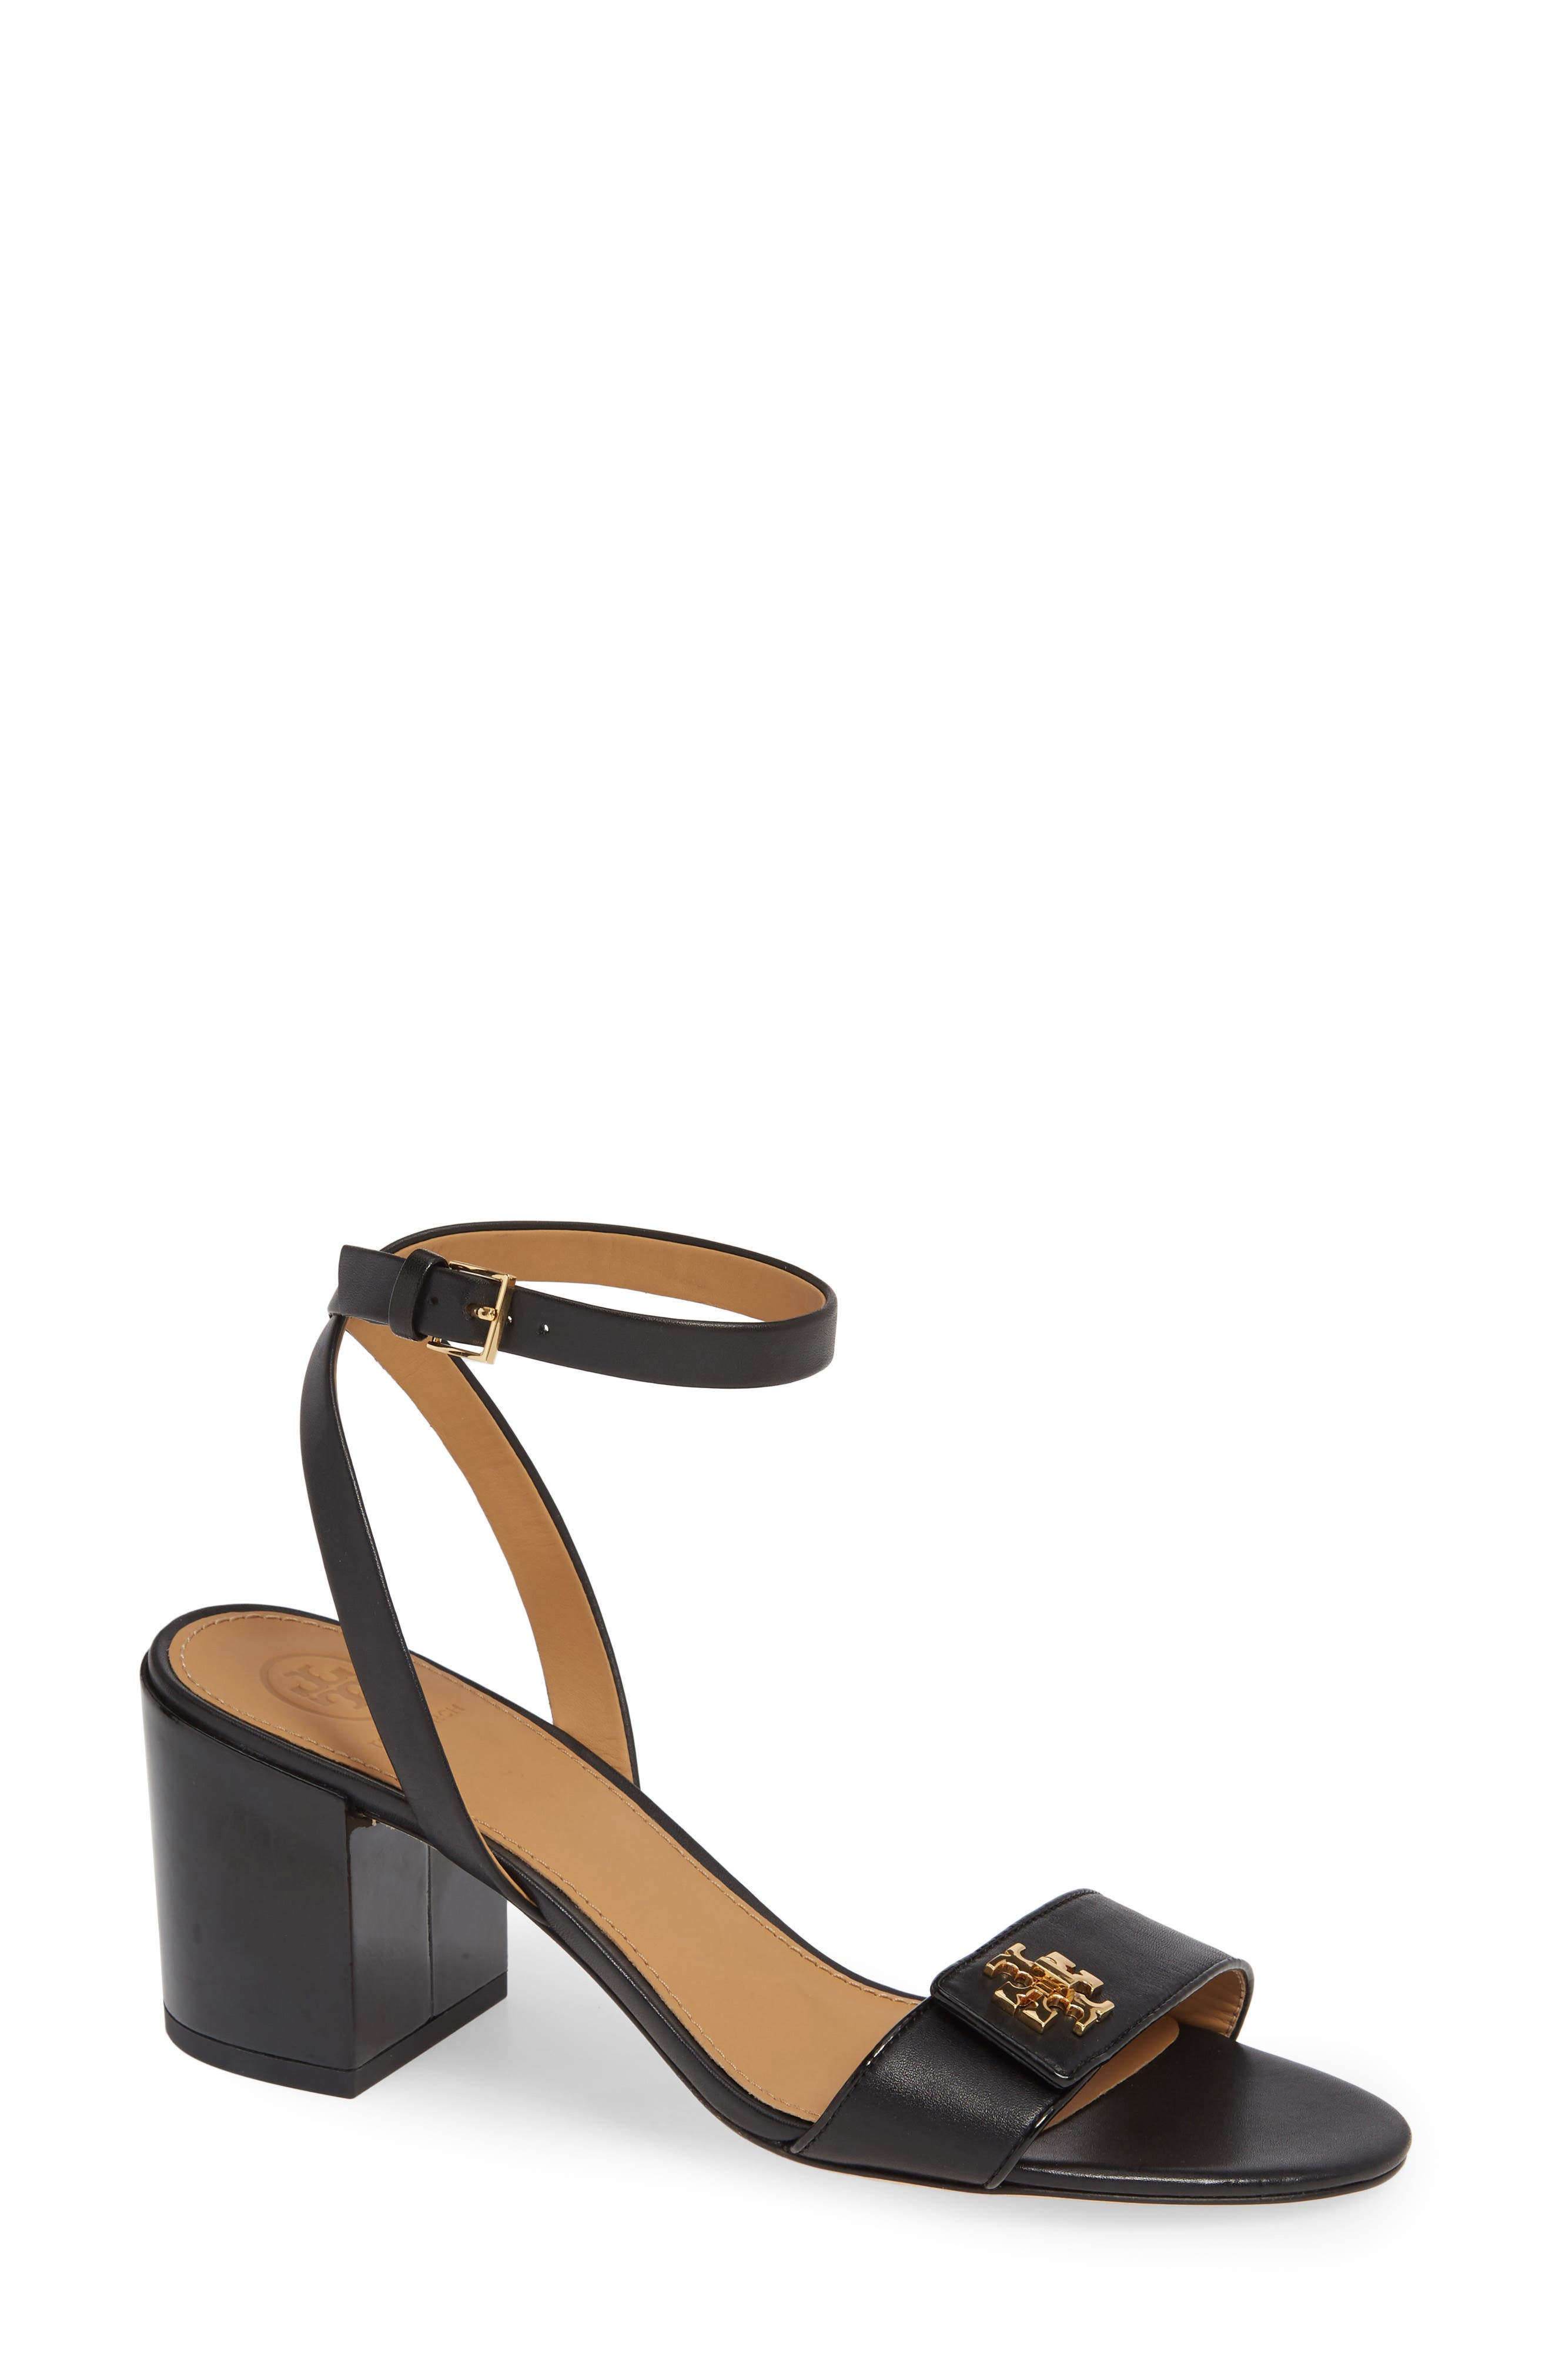 Kira Block Heel Sandal,                             Main thumbnail 1, color,                             PERFECT BLACK/ PERFECT BLACK